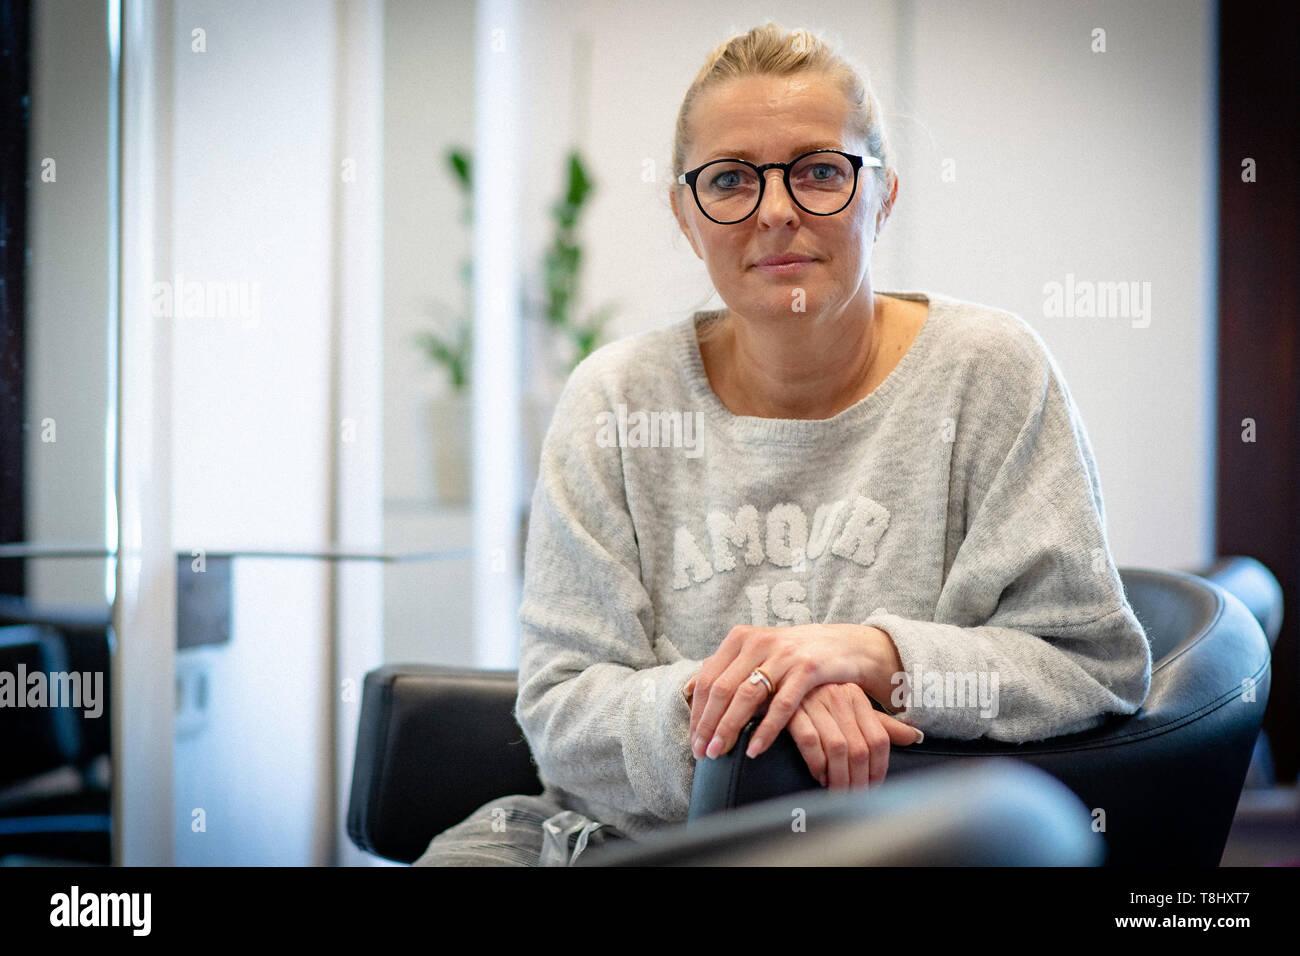 Kassel Deutschland 30 Apr 2019 Sandra Hilpert Master Friseur